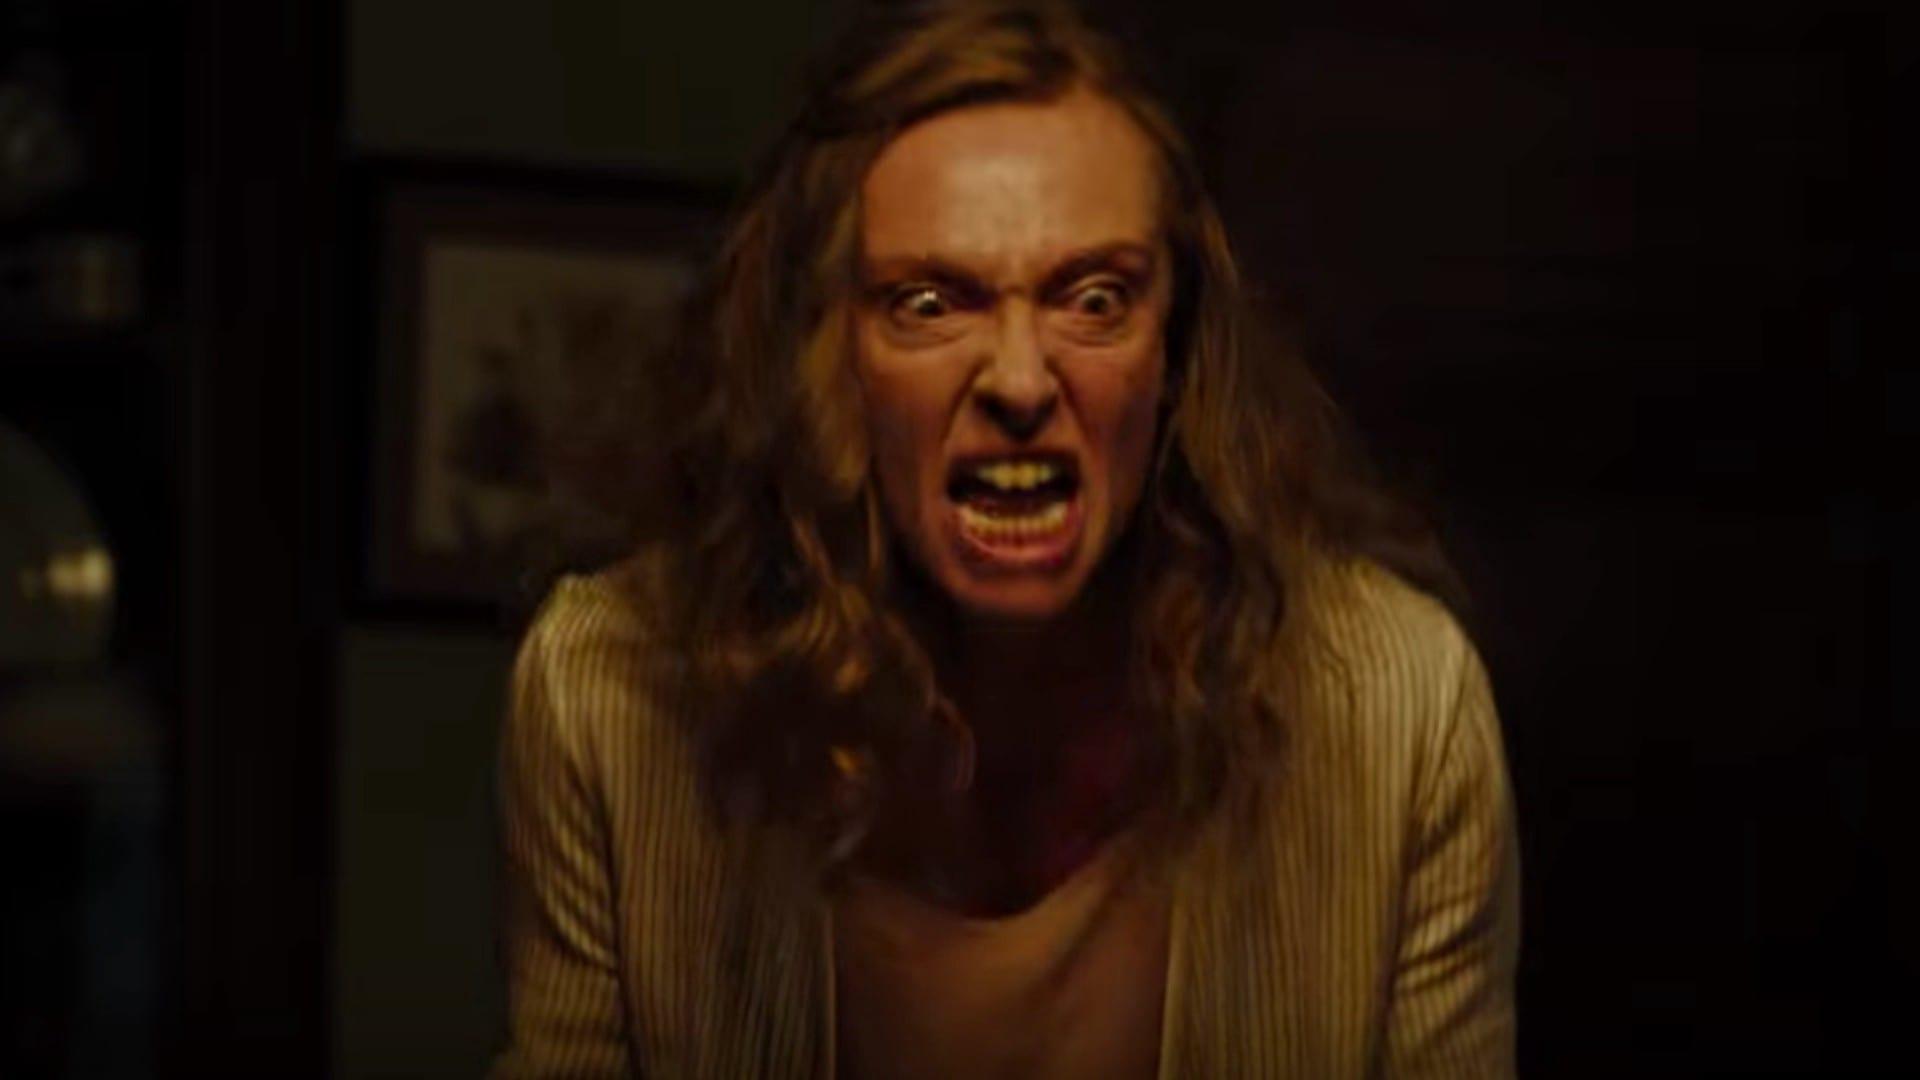 Filmes de terror mais assustadores de todos os tempos - Top 20